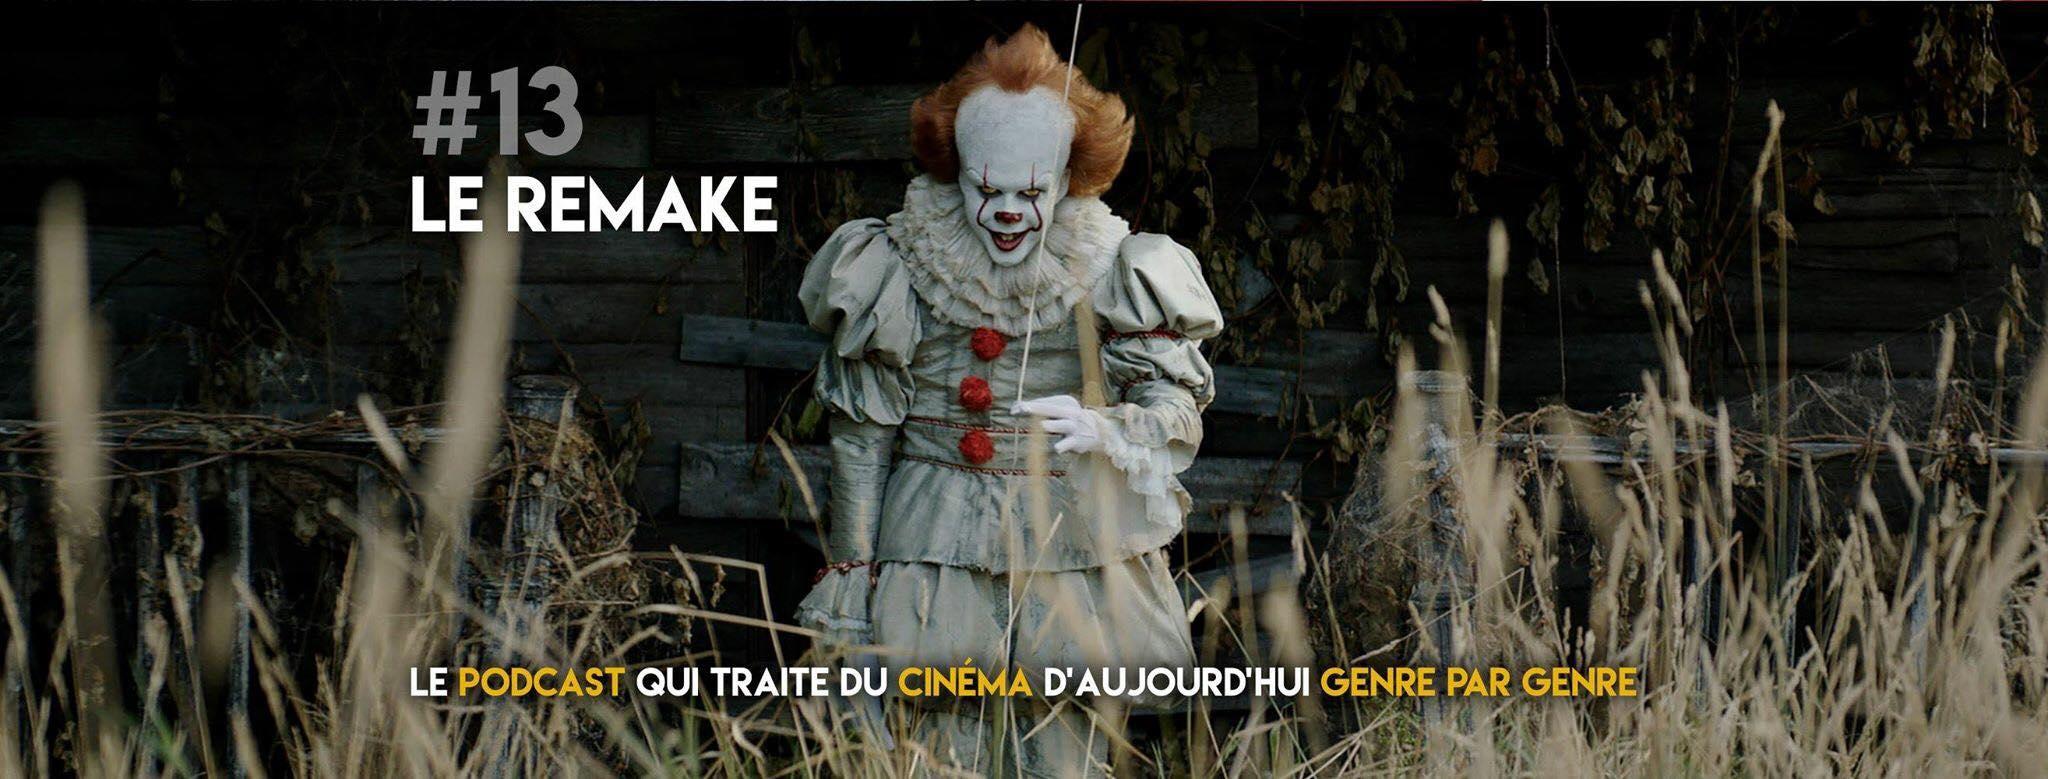 Parlons Péloches - #12 Le remake